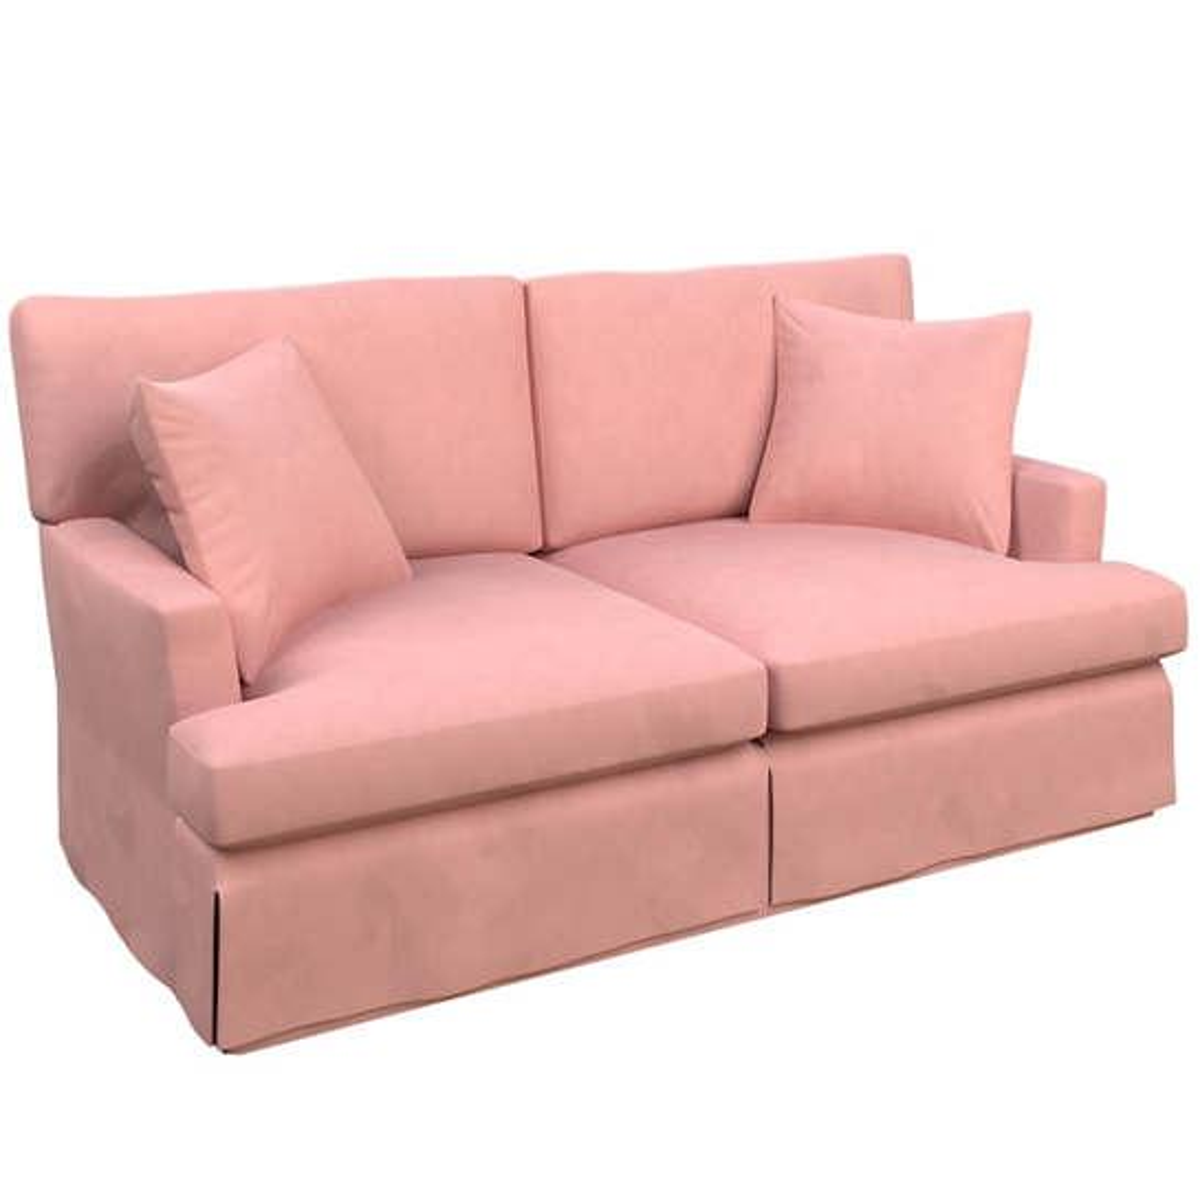 Lavender Rose Saybrook 2 Seater Sofa